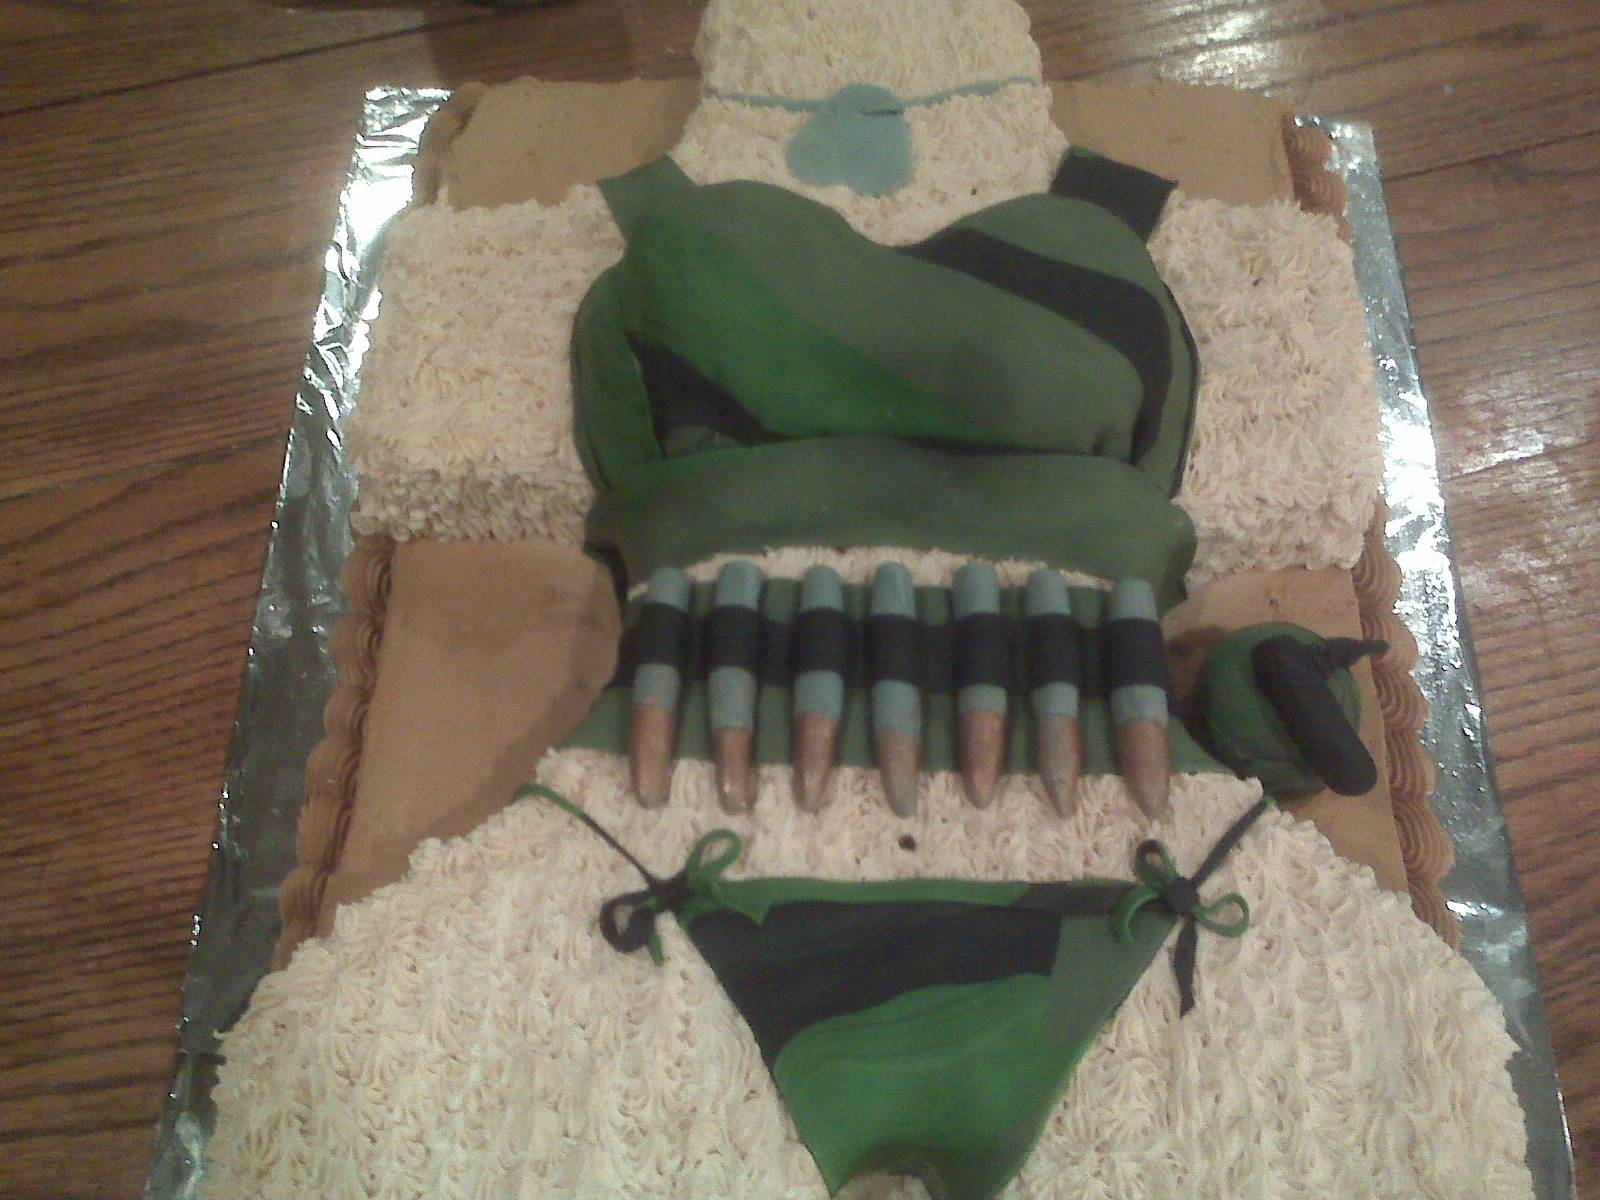 Camo grooms cake